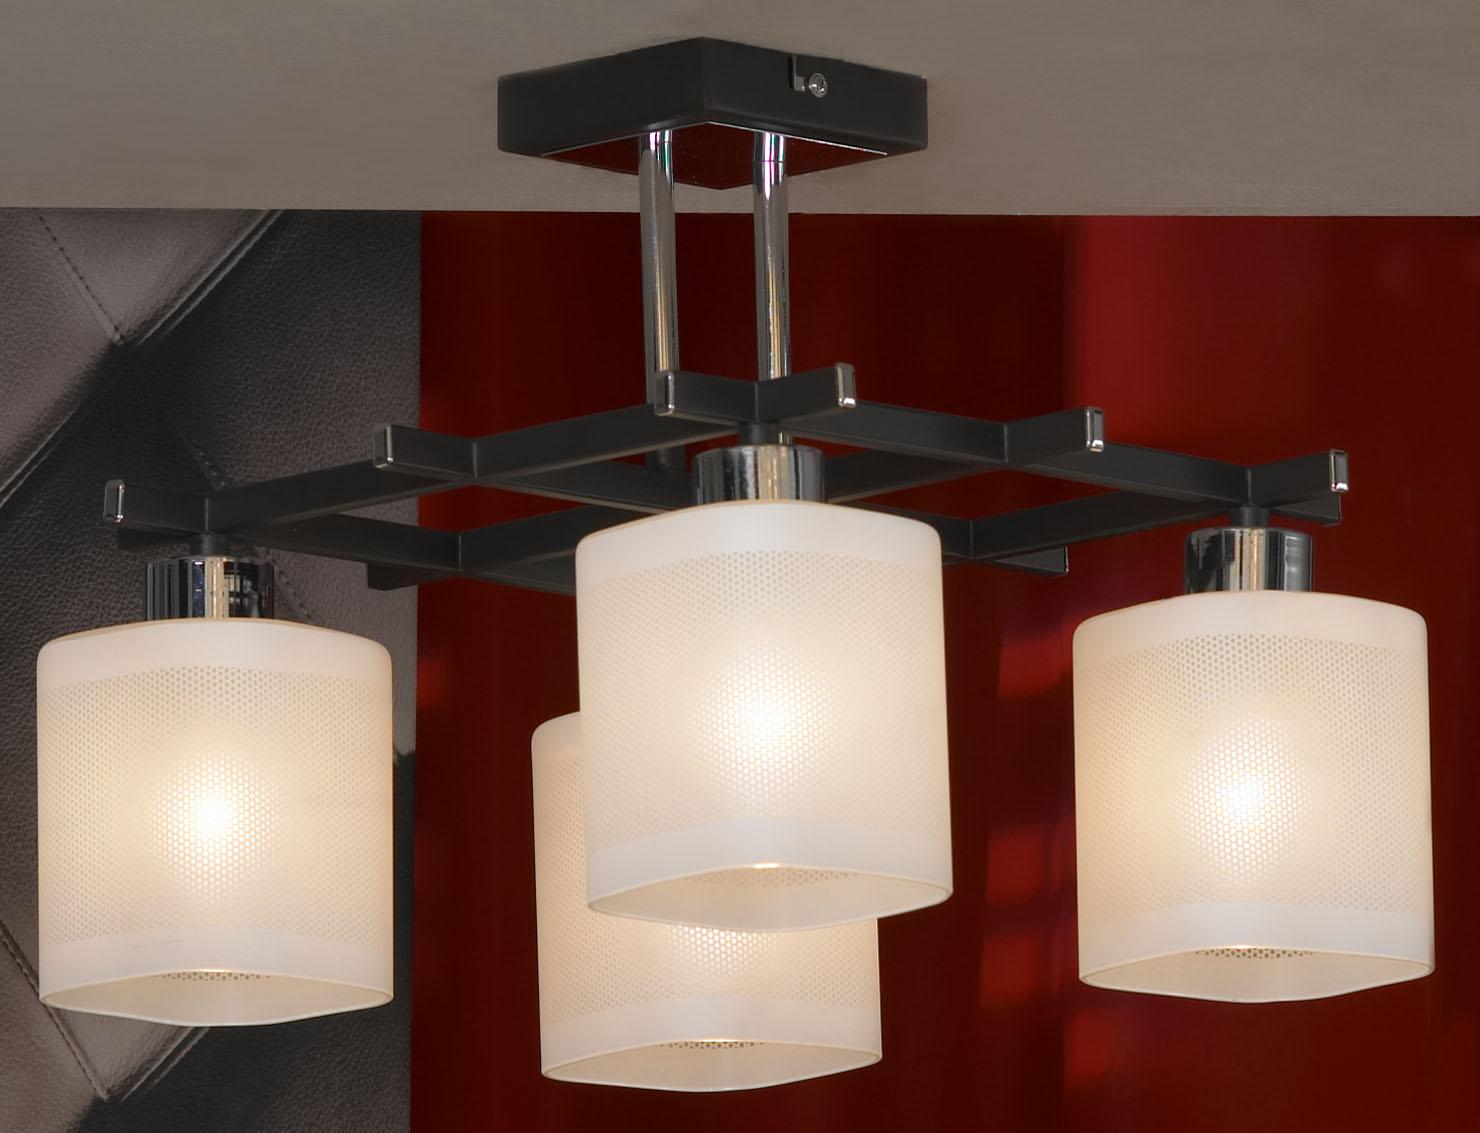 Люстра LussoleЛюстры<br>Назначение светильника: для комнаты,<br>Стиль светильника: модерн,<br>Тип: потолочная,<br>Материал светильника: металл, стекло,<br>Материал плафона: стекло,<br>Материал арматуры: металл,<br>Длина (мм): 300,<br>Ширина: 330,<br>Количество ламп: 4,<br>Тип лампы: накаливания,<br>Мощность: 40,<br>Патрон: Е14,<br>Цвет арматуры: хром<br>